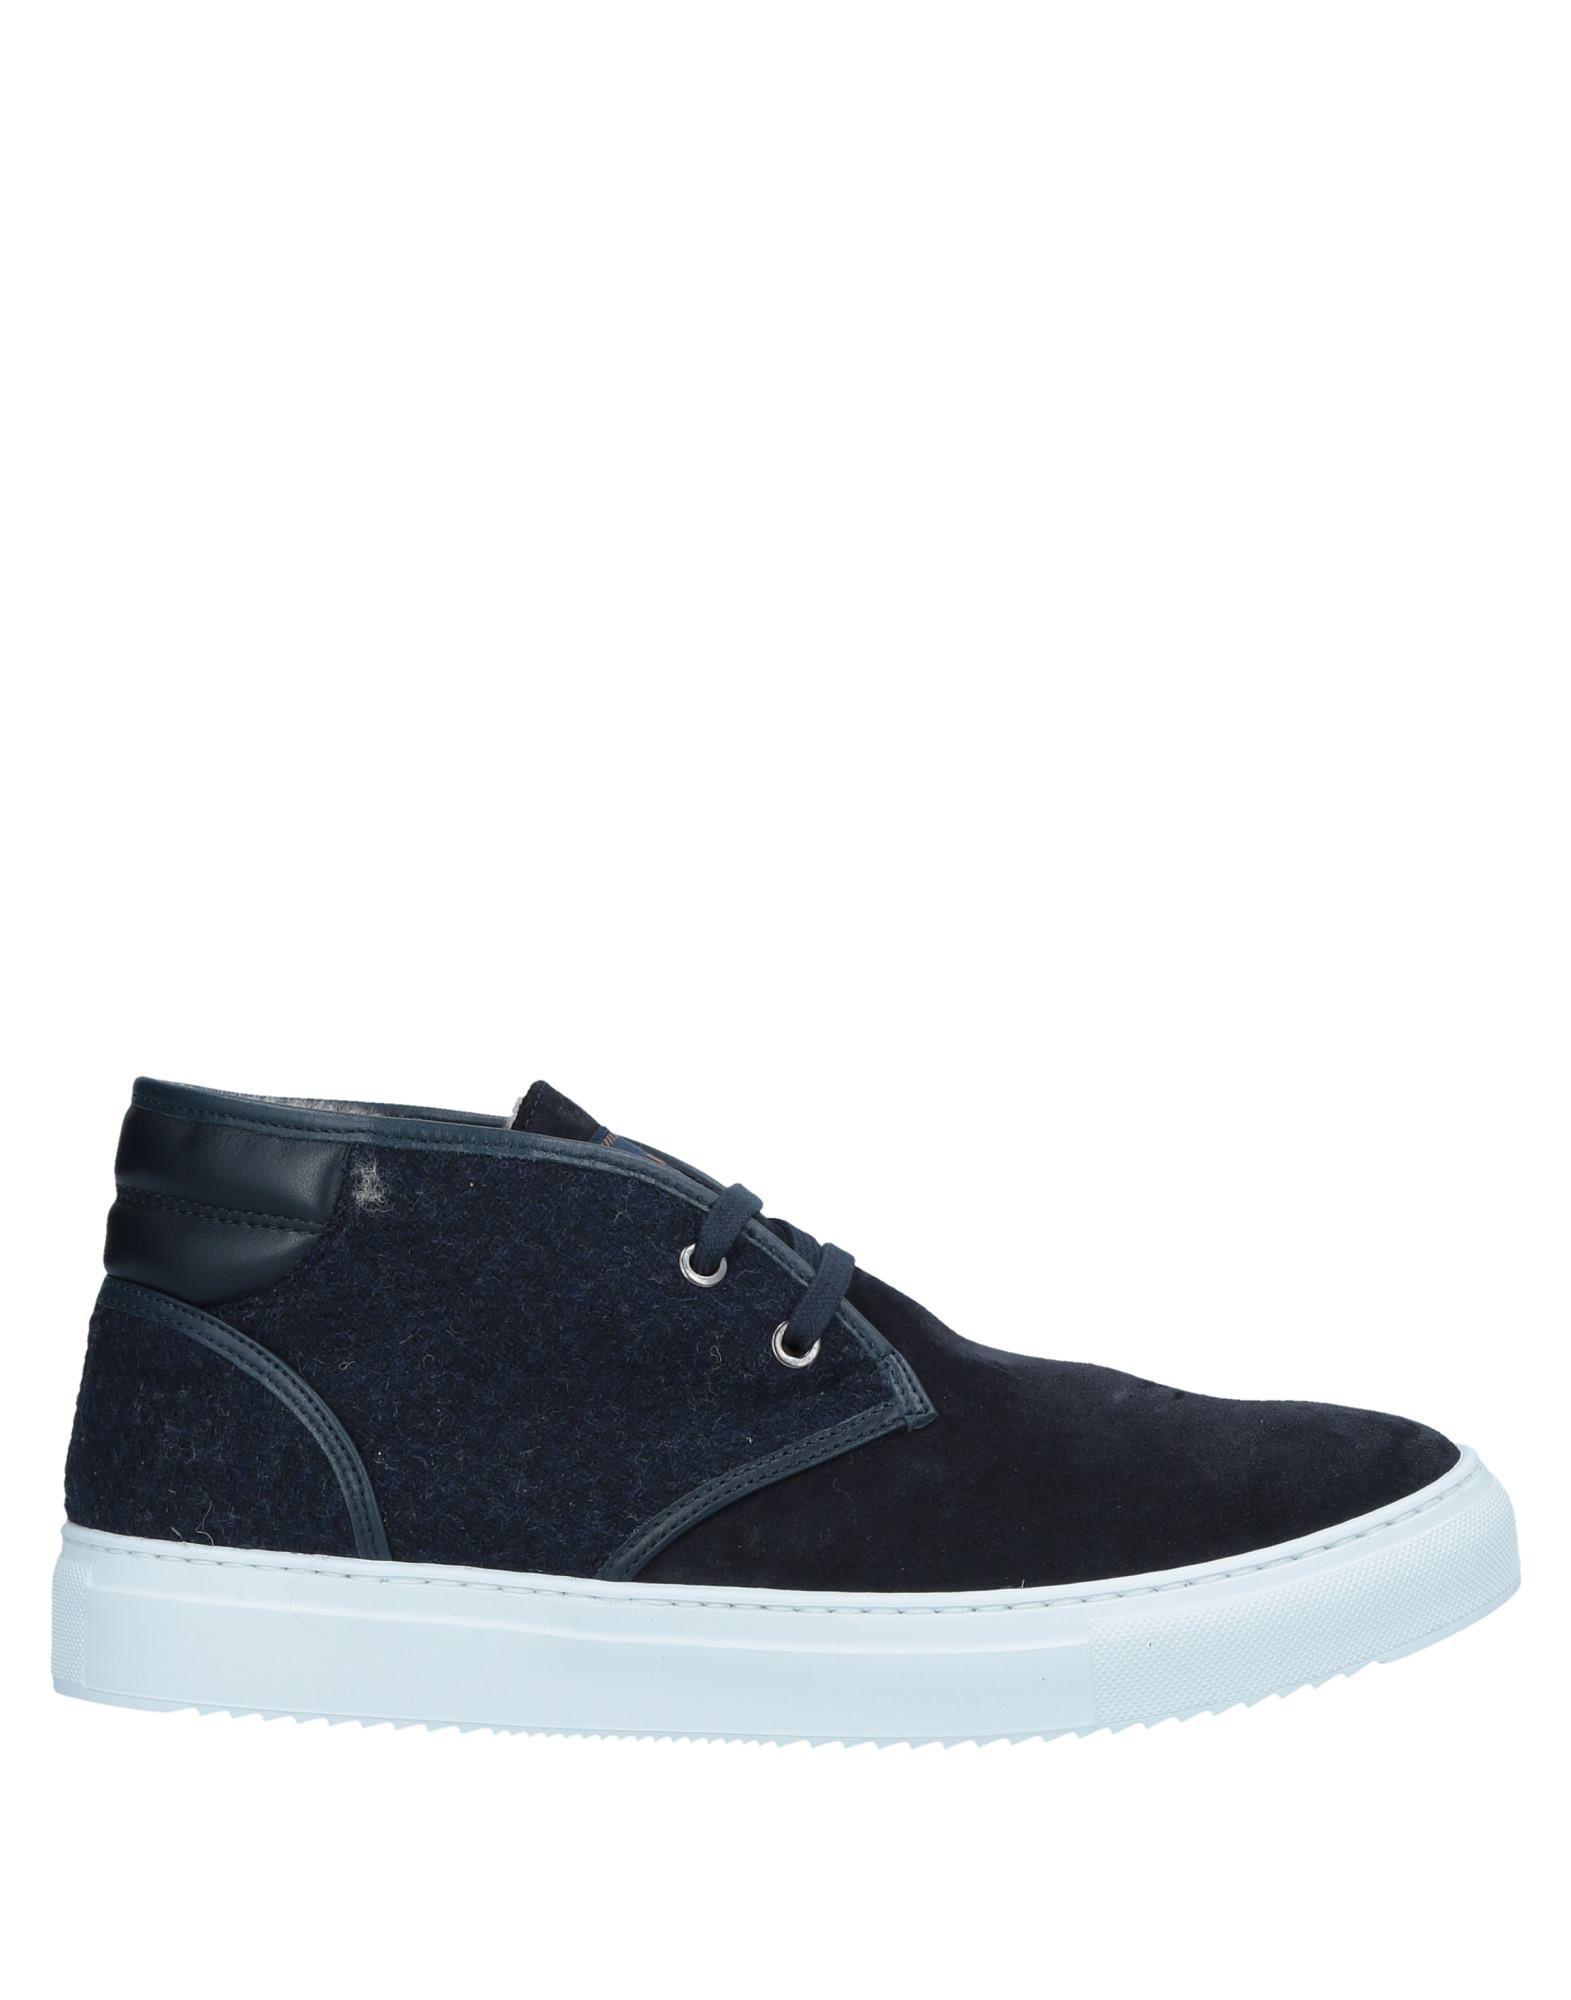 Moda 11532453WN Sneakers Fabi Uomo - 11532453WN Moda 3d638d